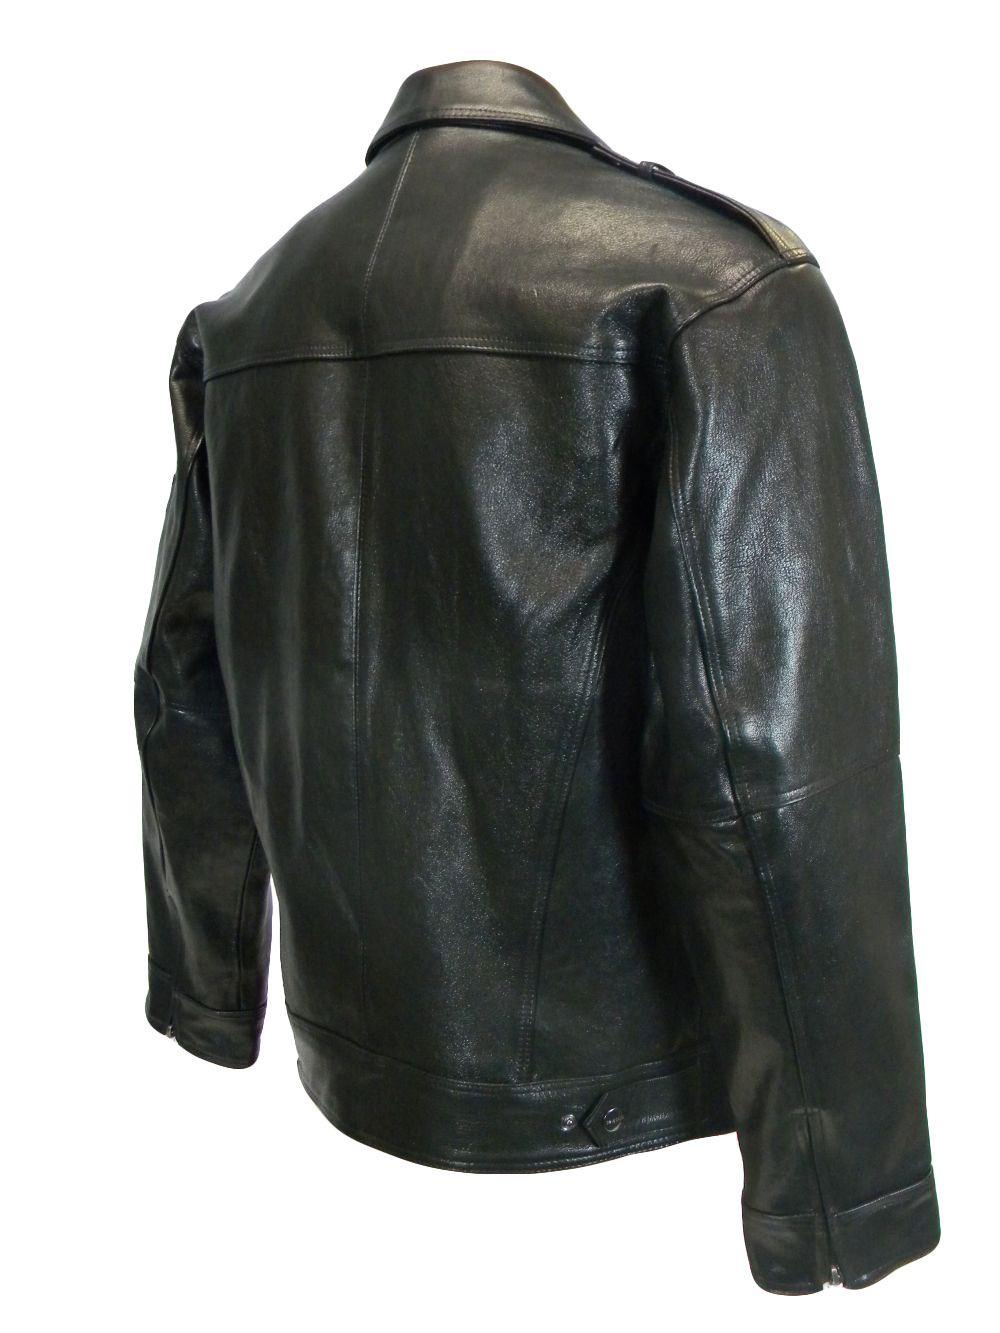 Pelle Pelle Men's Basic Biker Applique Jacket